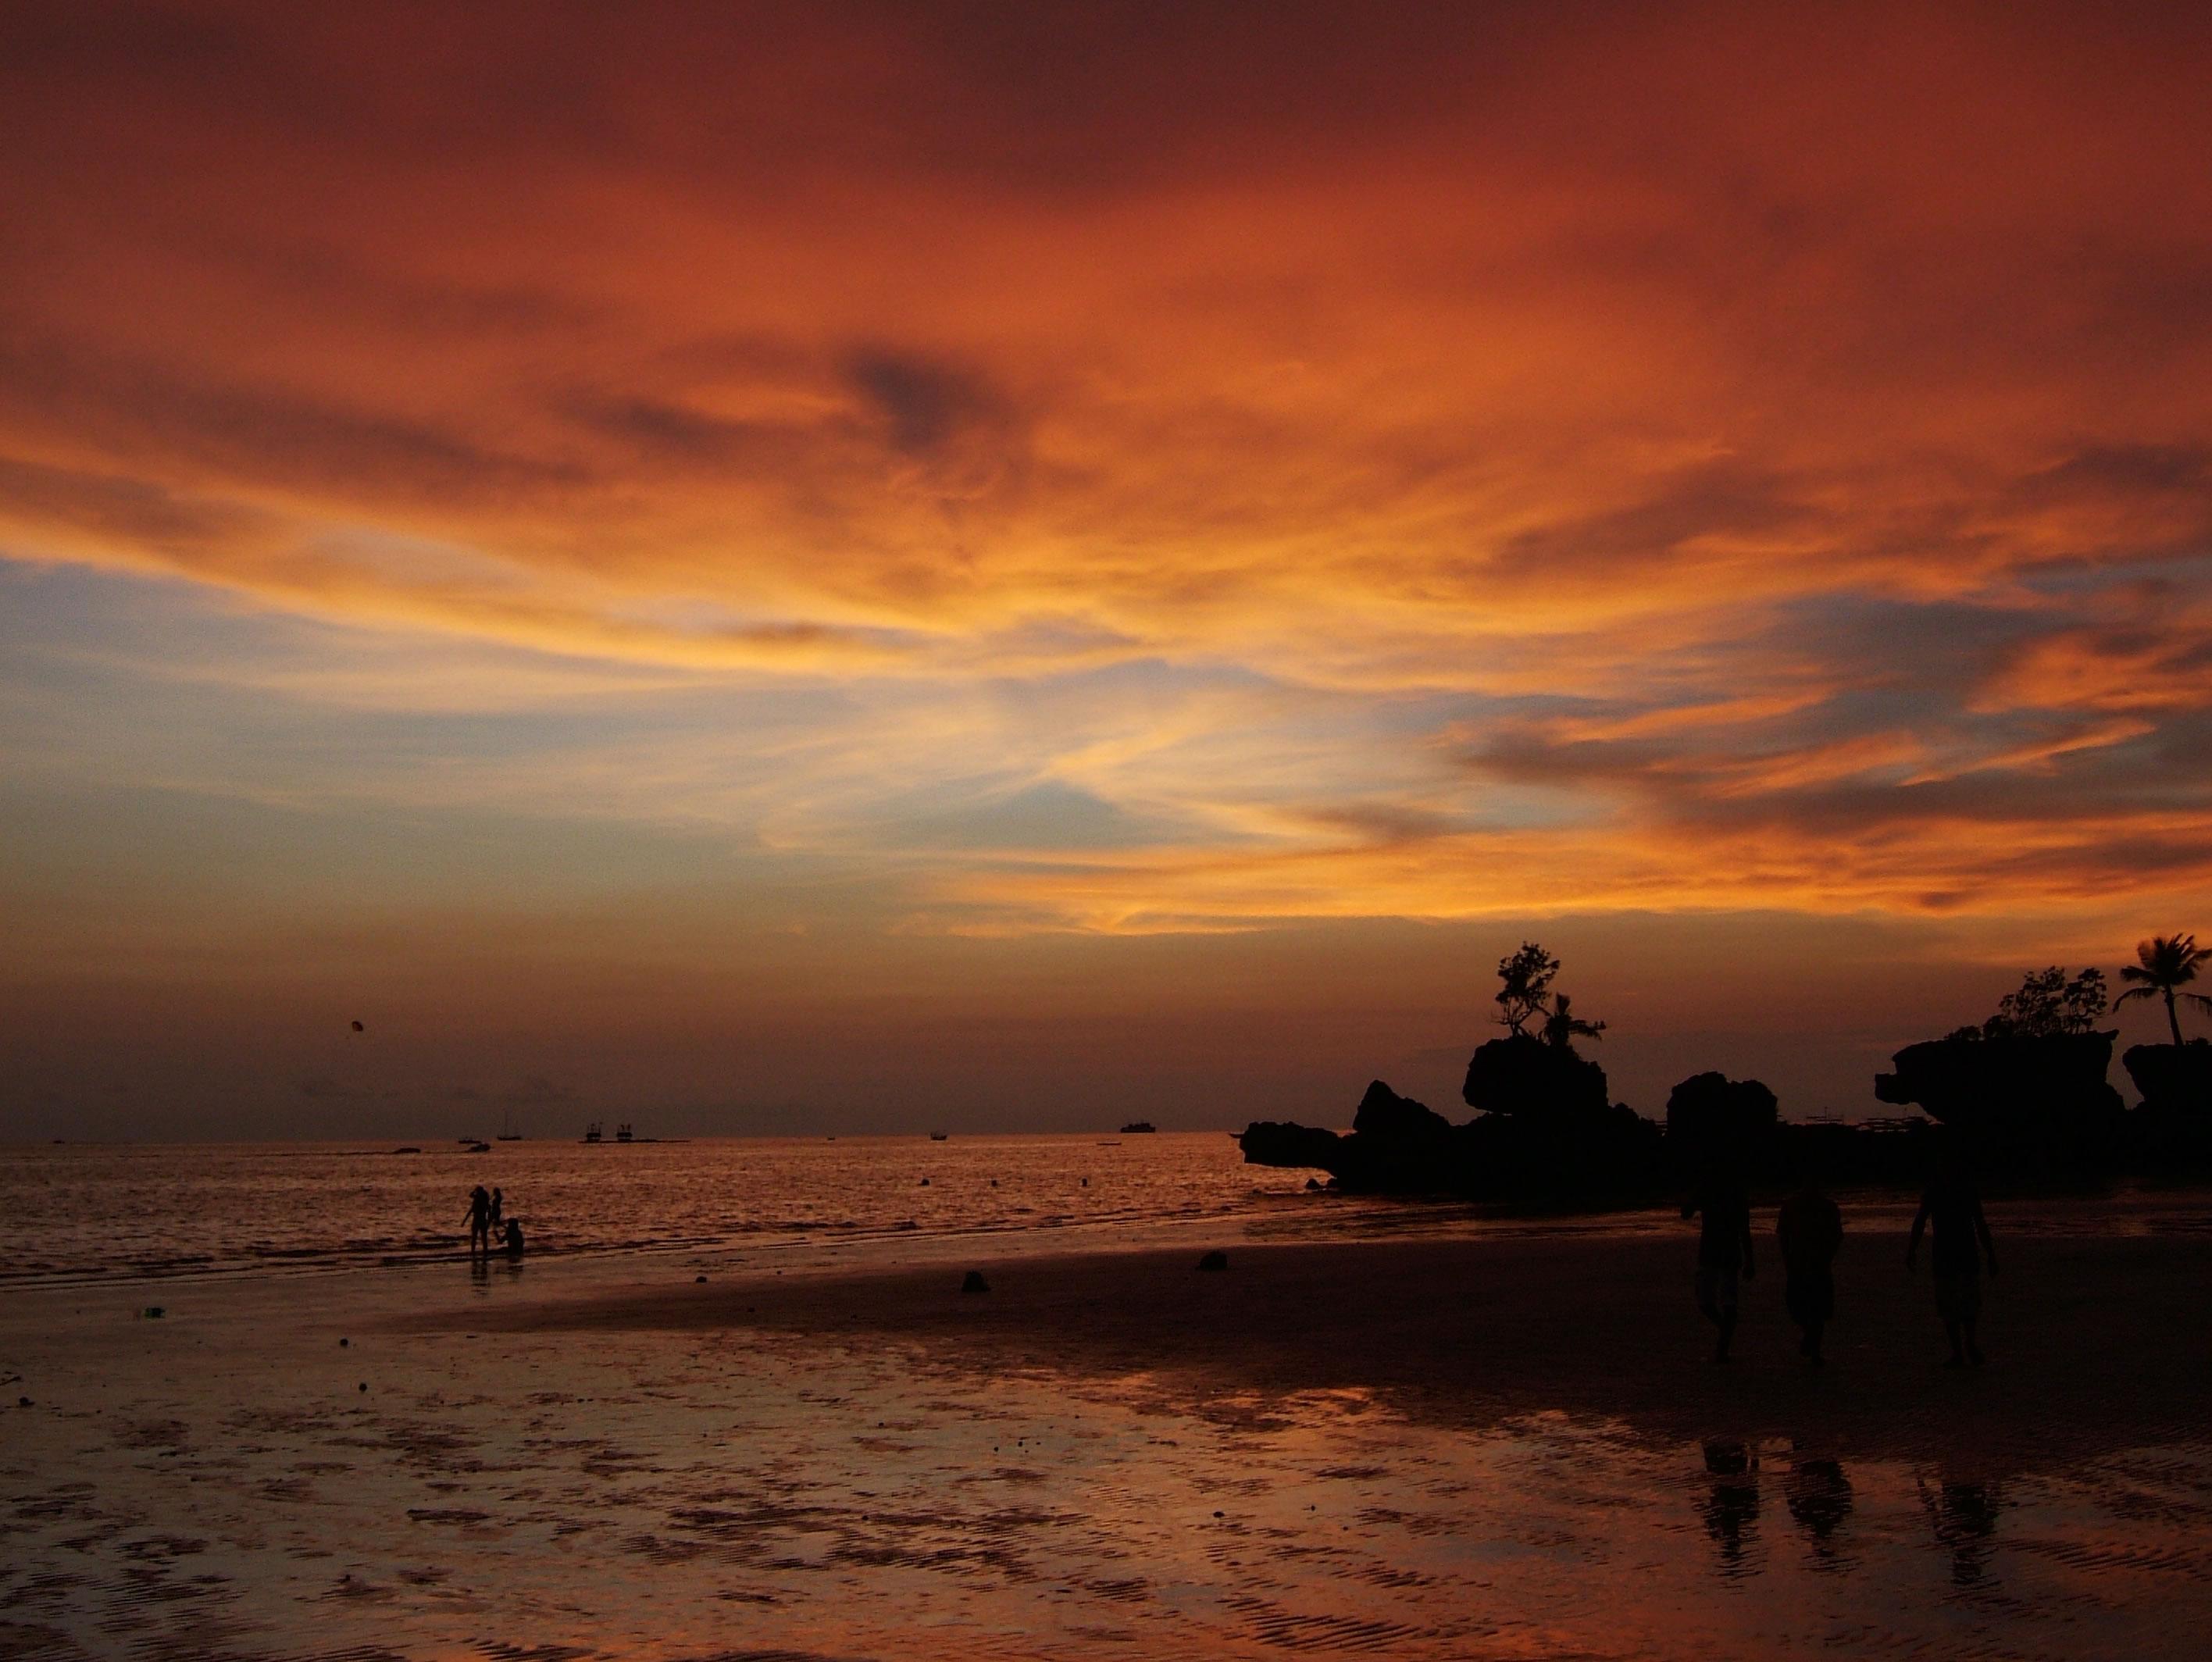 Philippines Sugar Islands Caticlan Boracay White Beach Sunset 2007 48